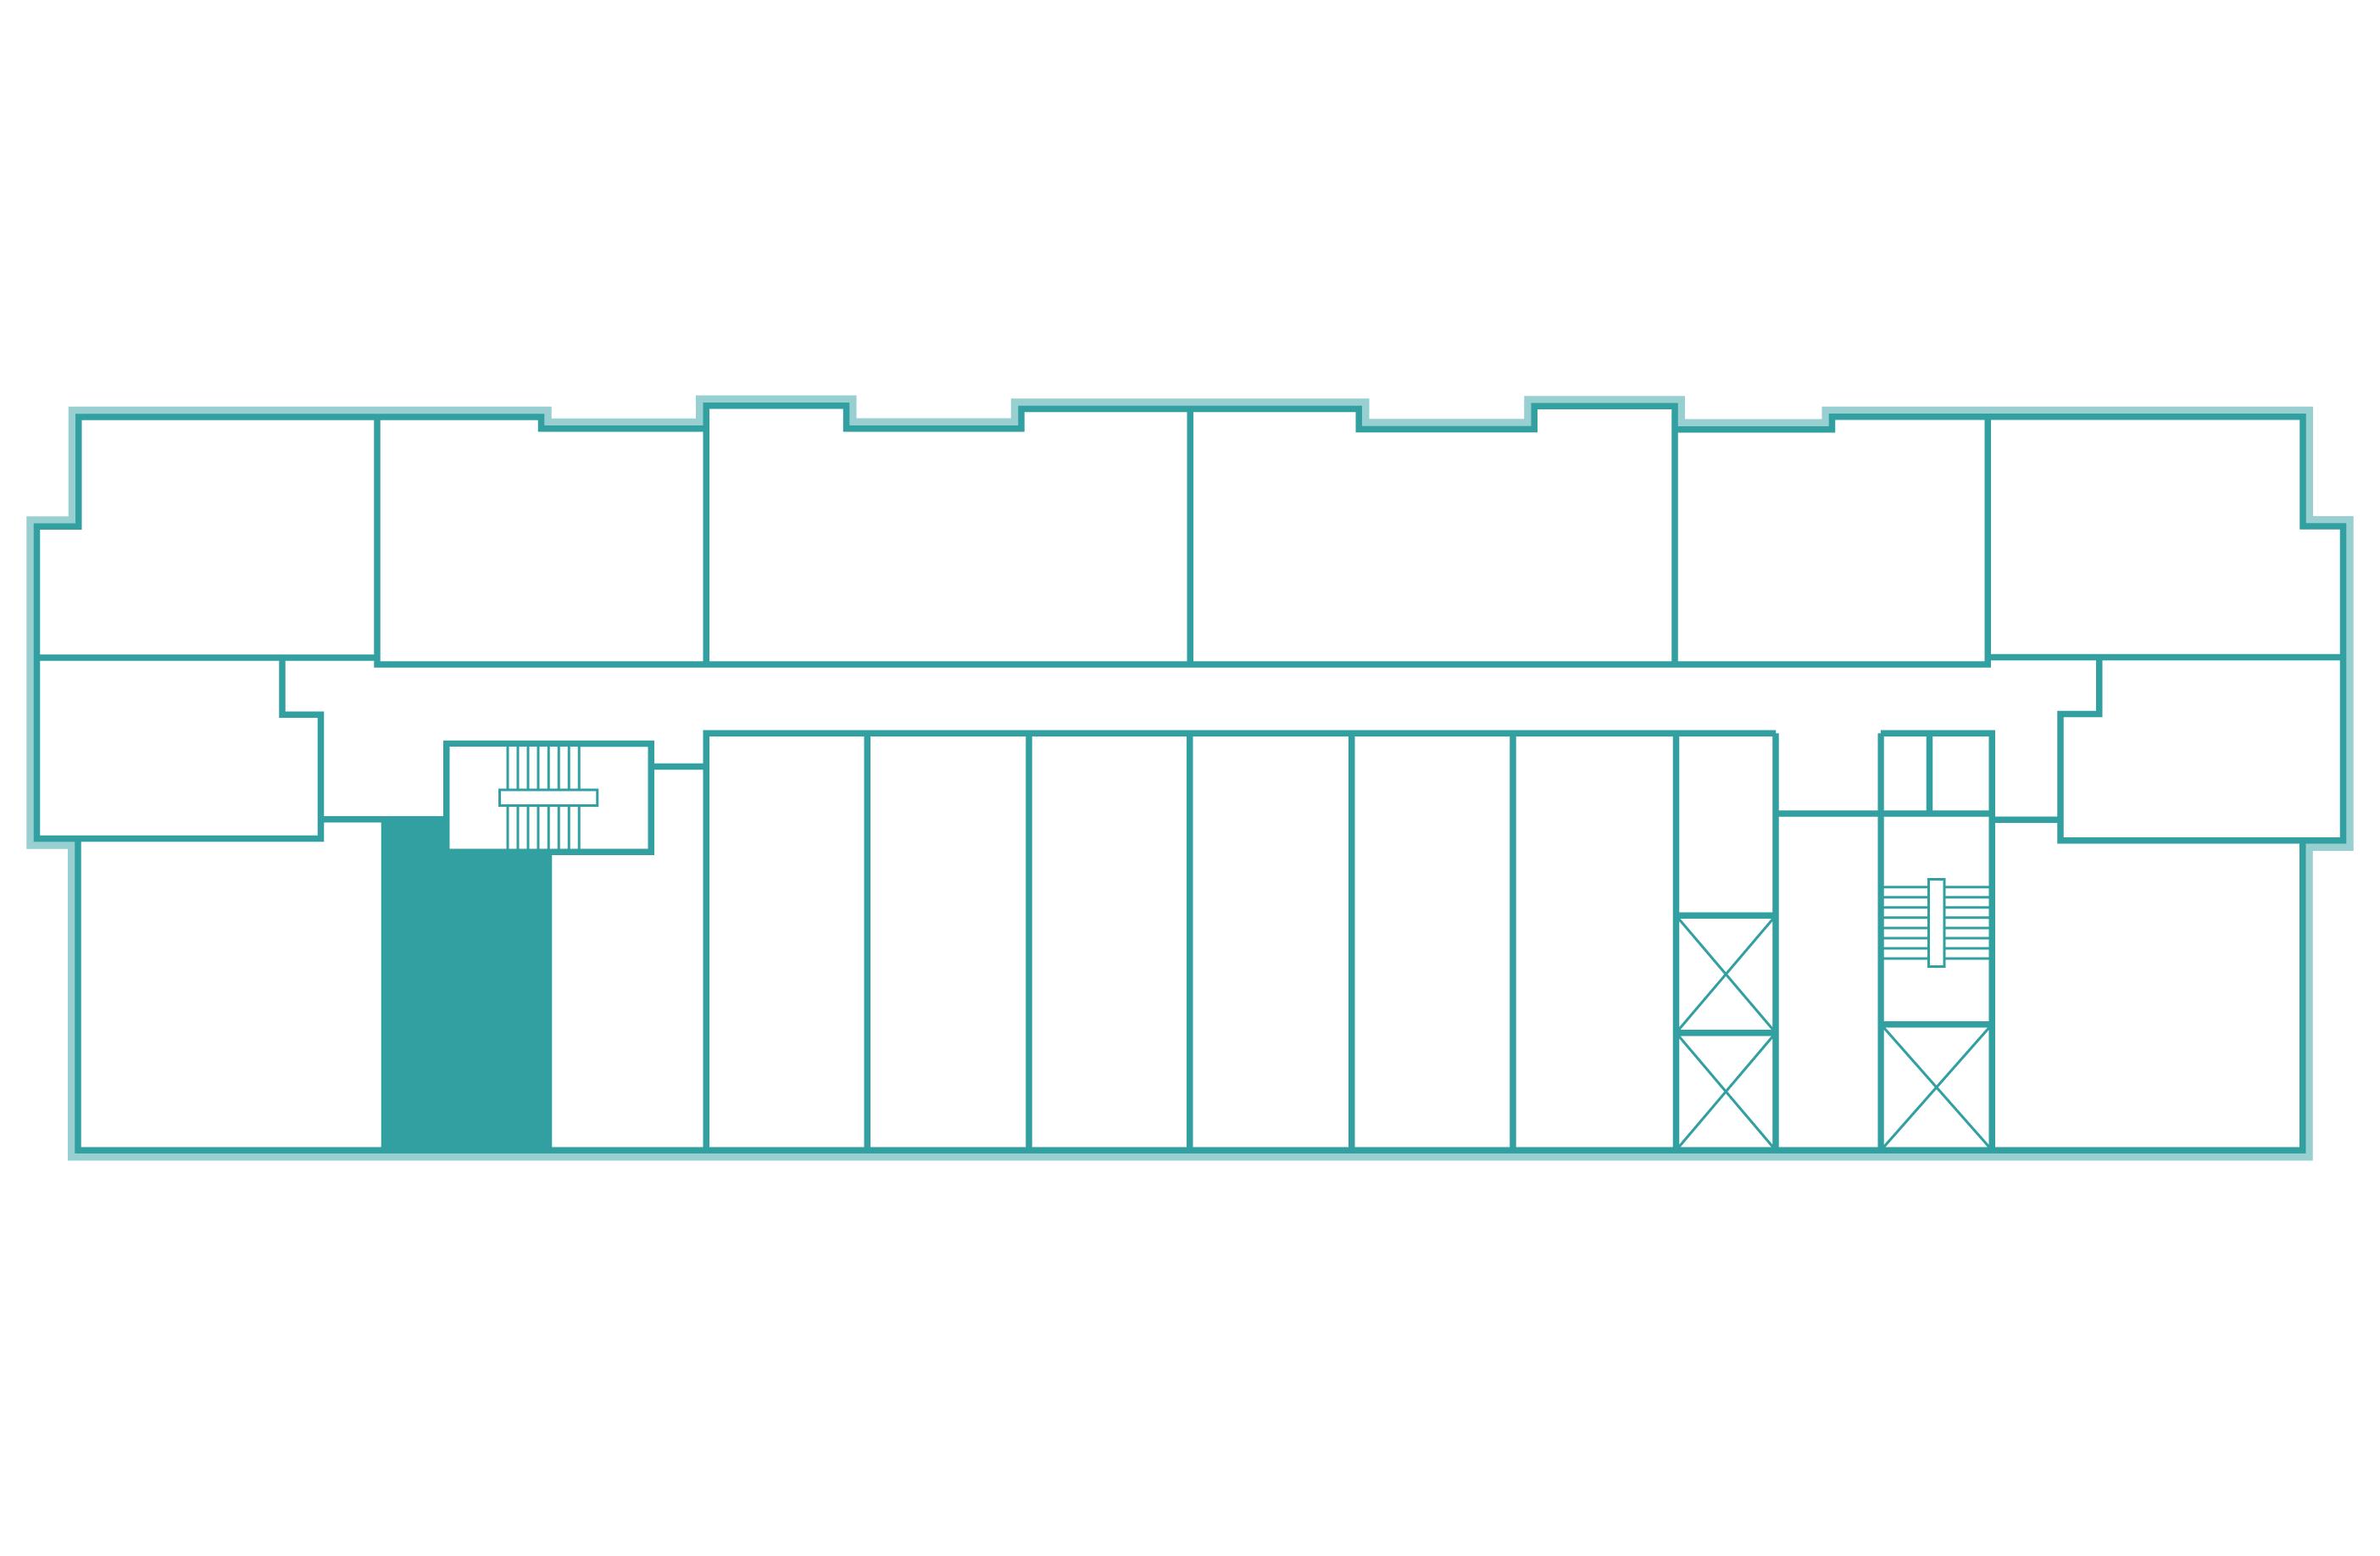 floorplan image of unit image 0708